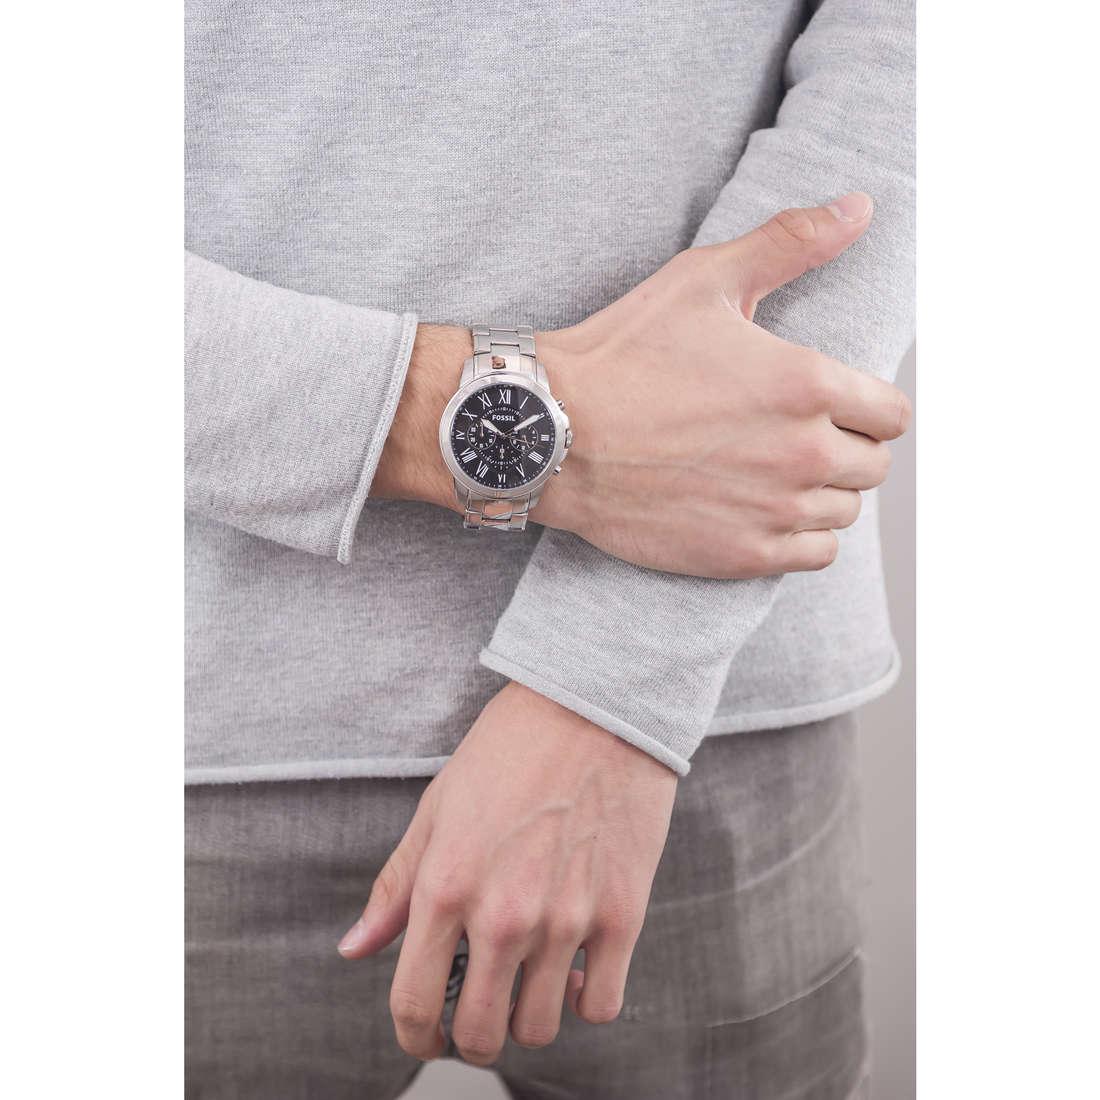 Fossil cronografi uomo FS4736 indosso